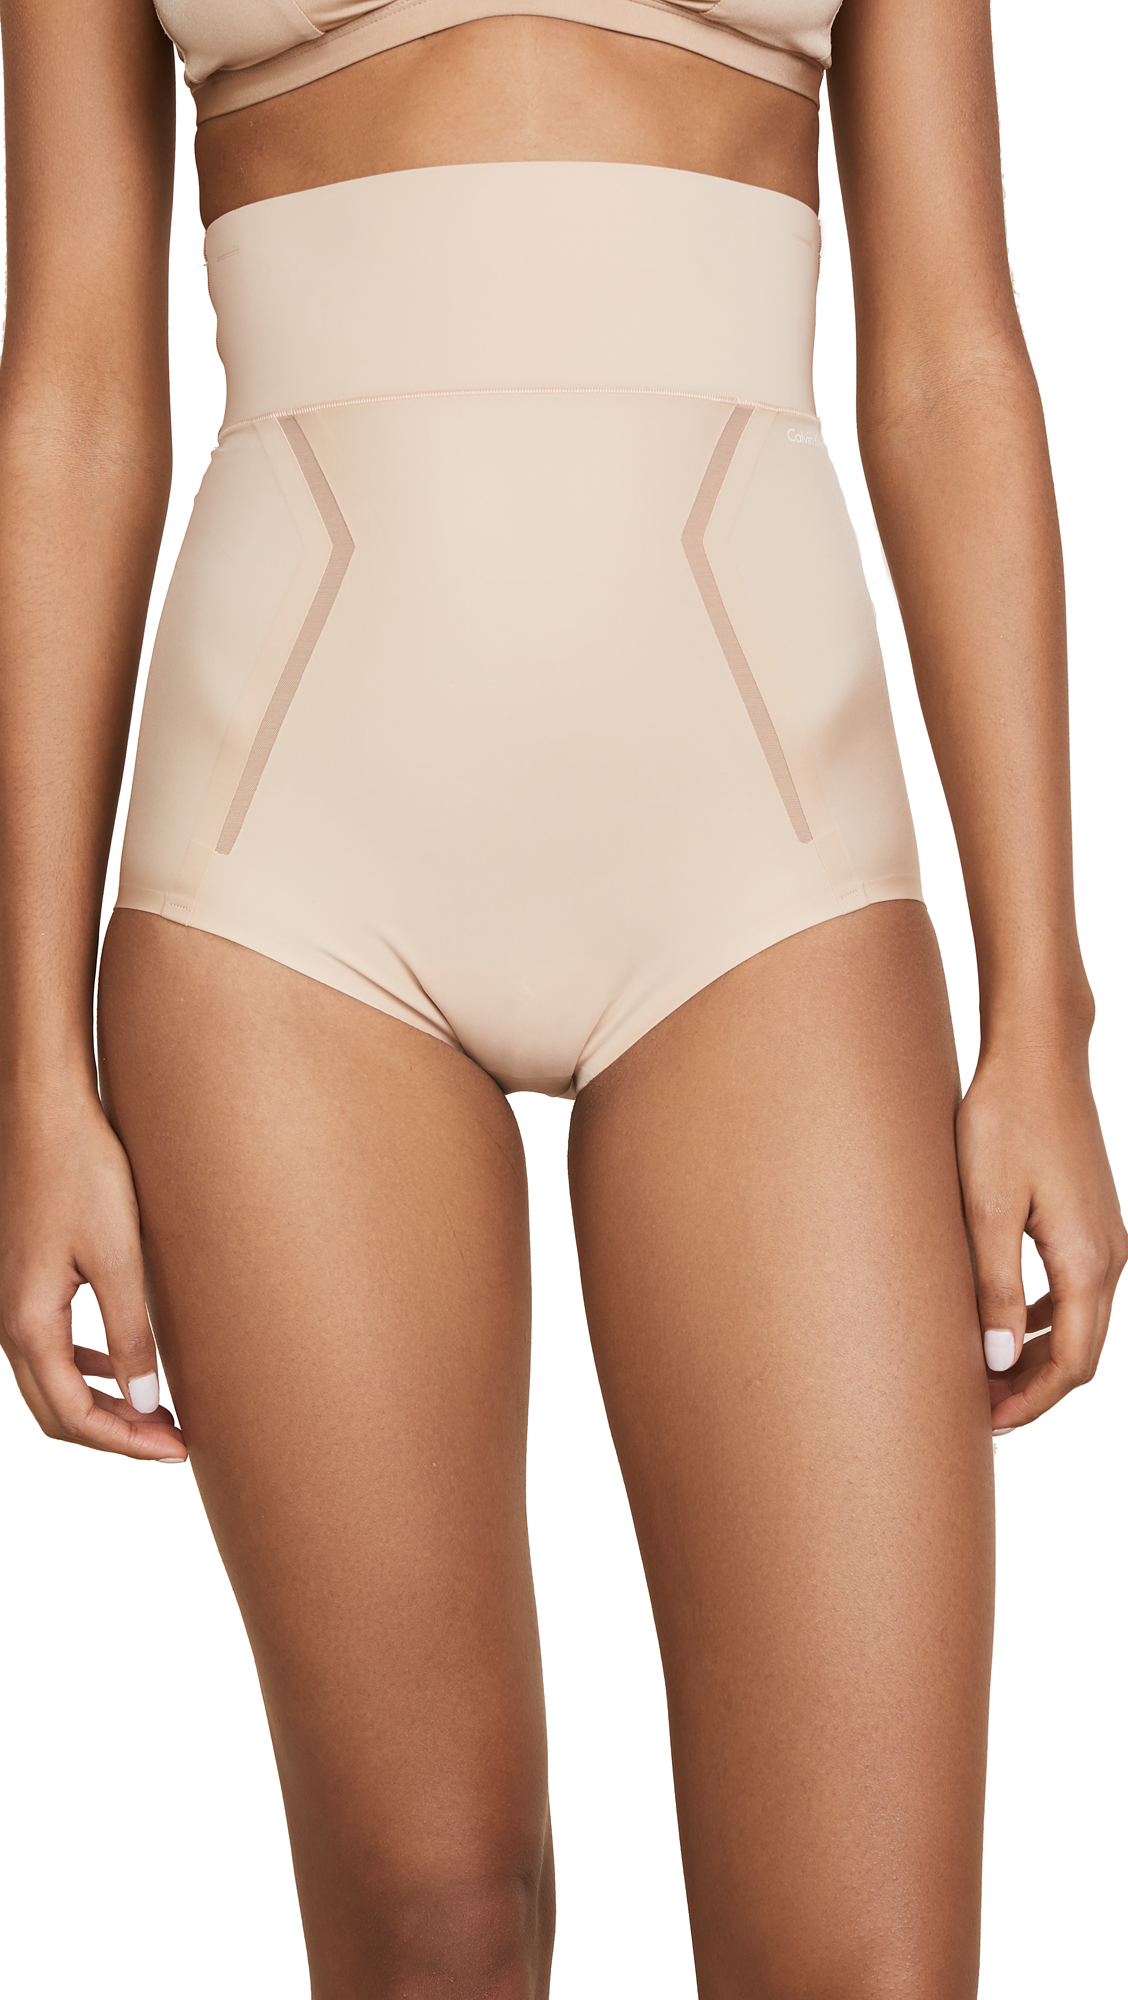 88d49ce7e5 Calvin Klein Underwear Sculpted Shapewear High Waist Briefs In Bare